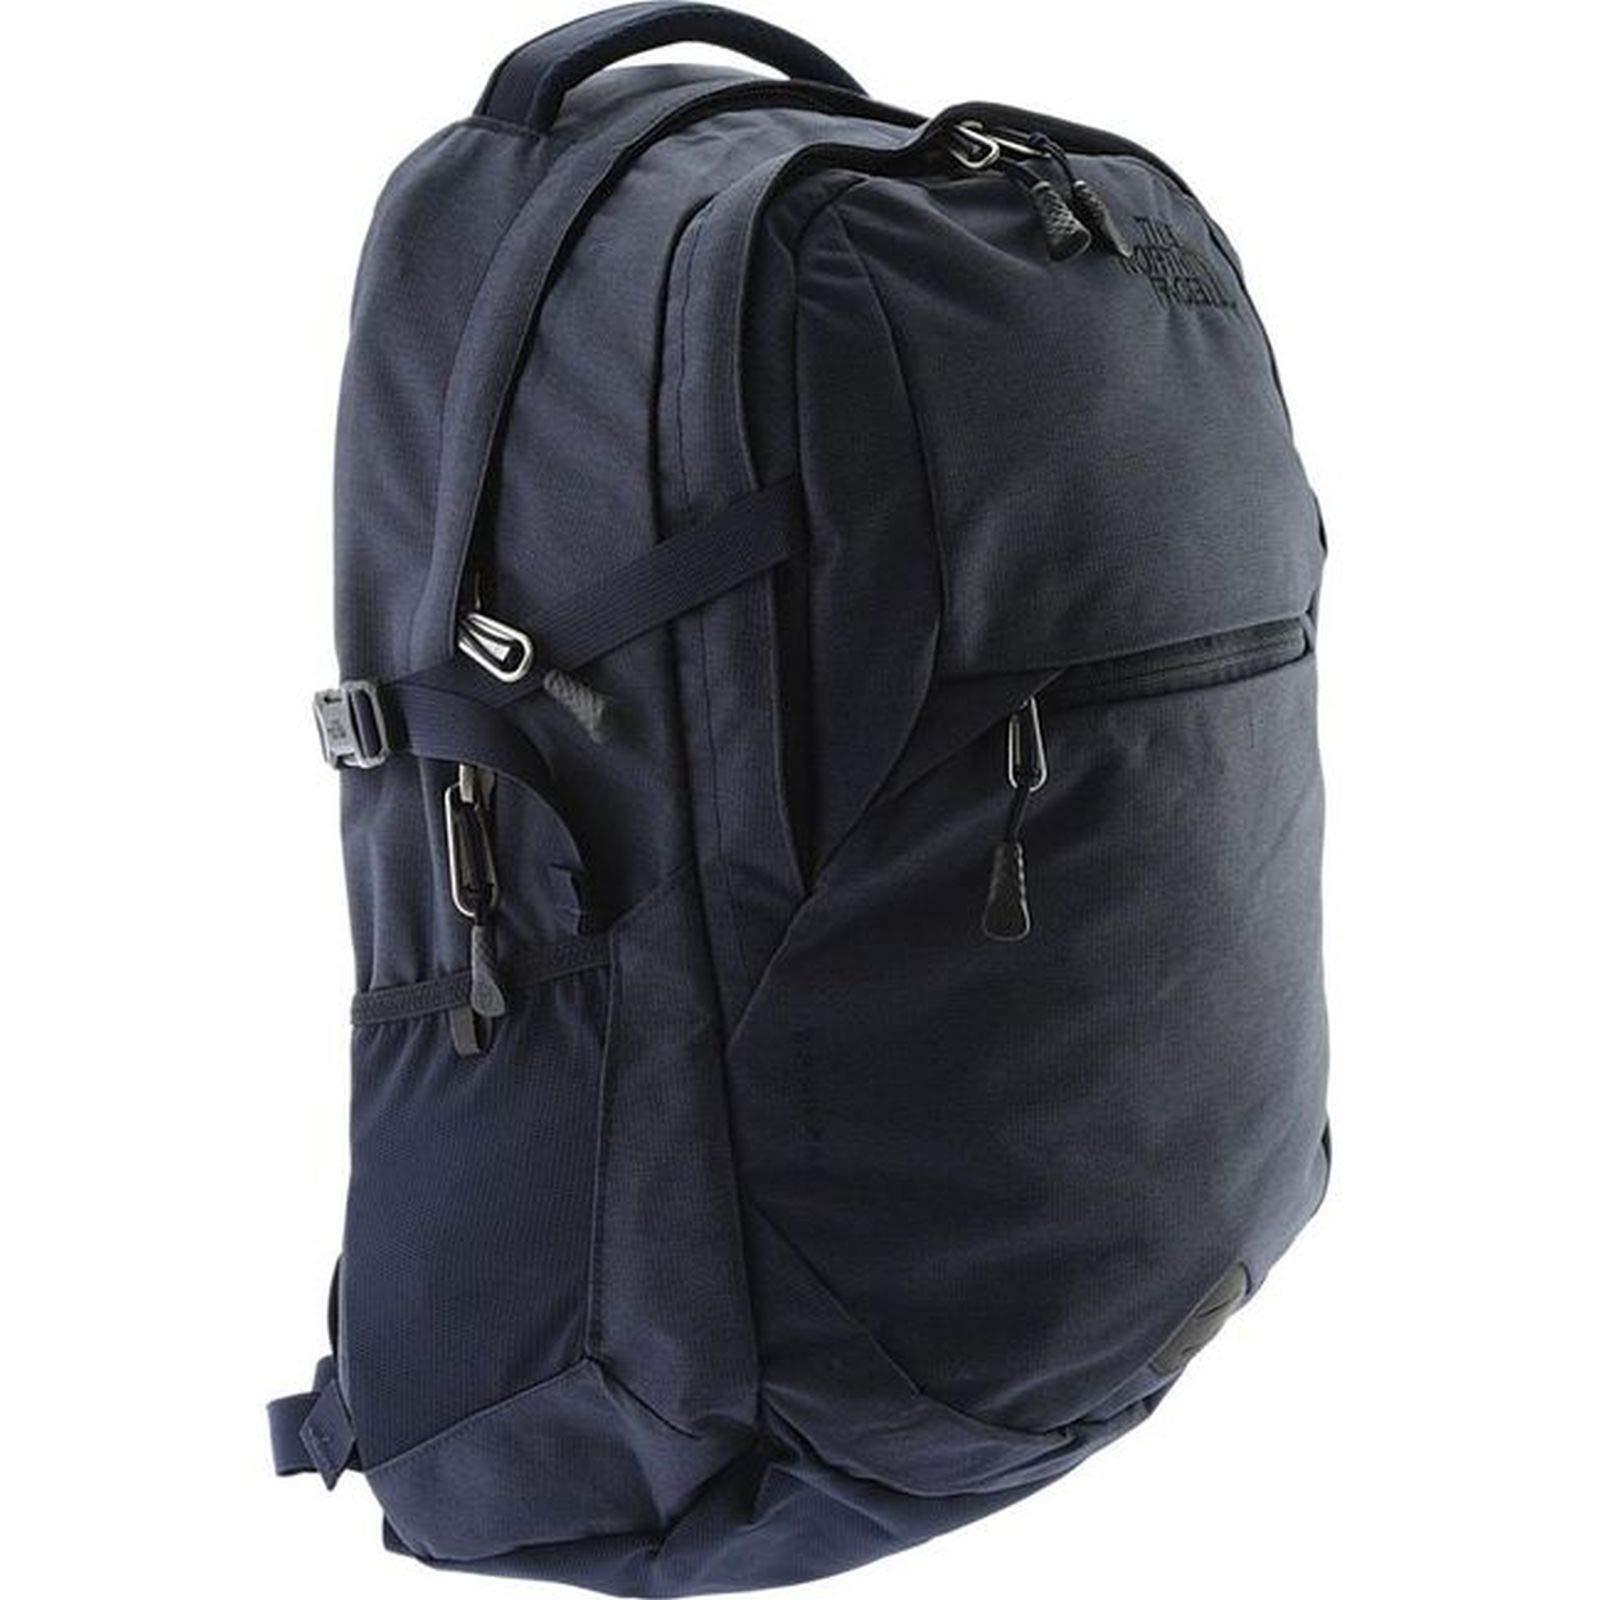 The North Face Yavapai Backpack (Urban Navy Light Heather/Urban Navy) by The North Face